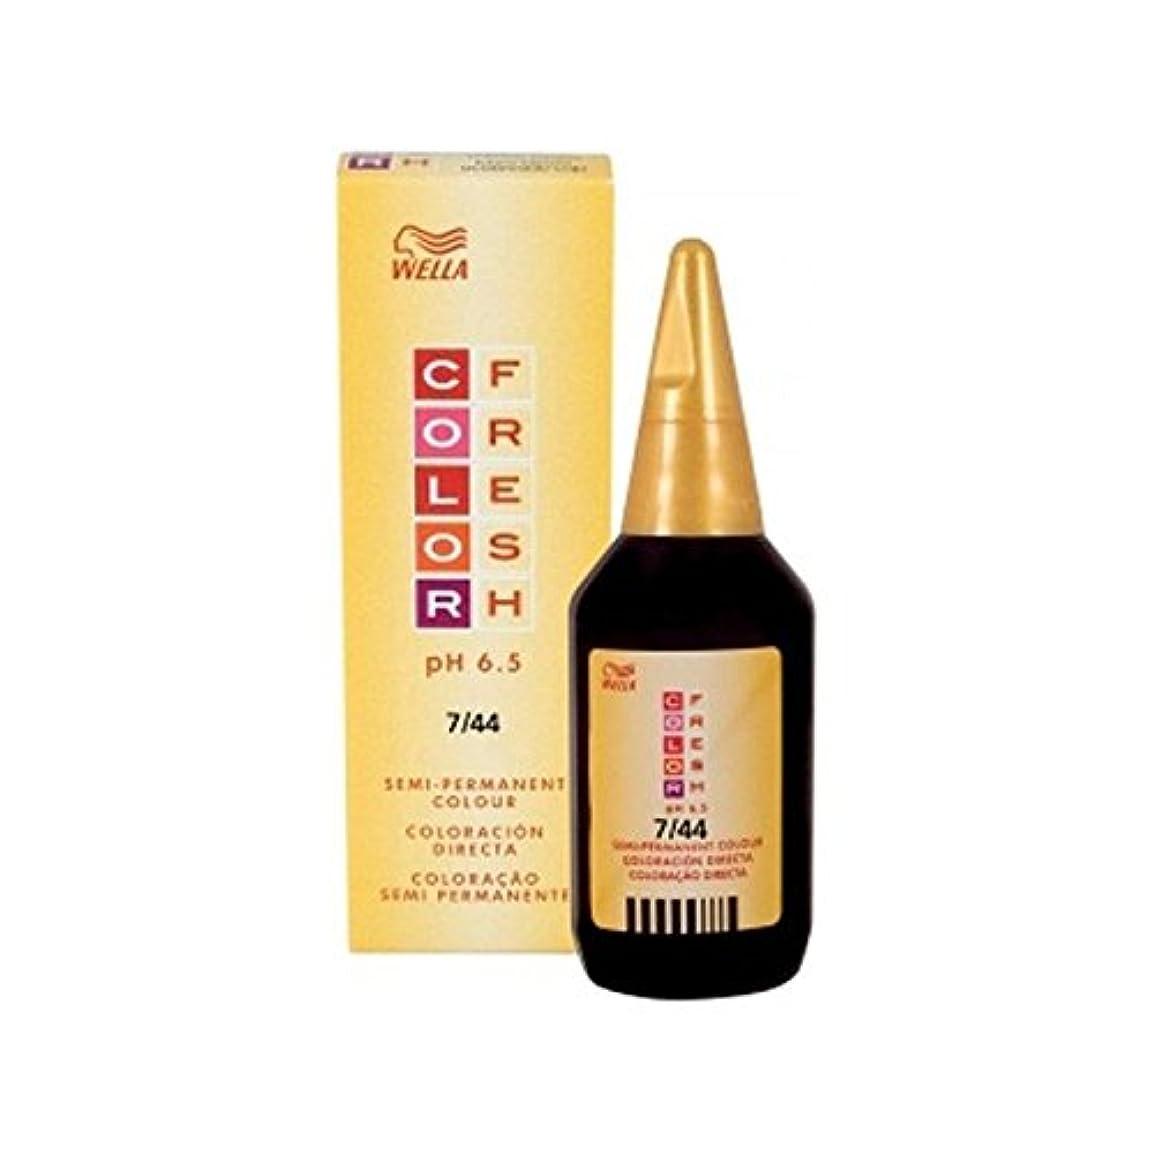 Wella Color Fresh Medium Intense Red Blonde 7.44 (75ml) - ウエラカラー新鮮な培地強い赤色ブロンド7.44(75ミリリットル) [並行輸入品]